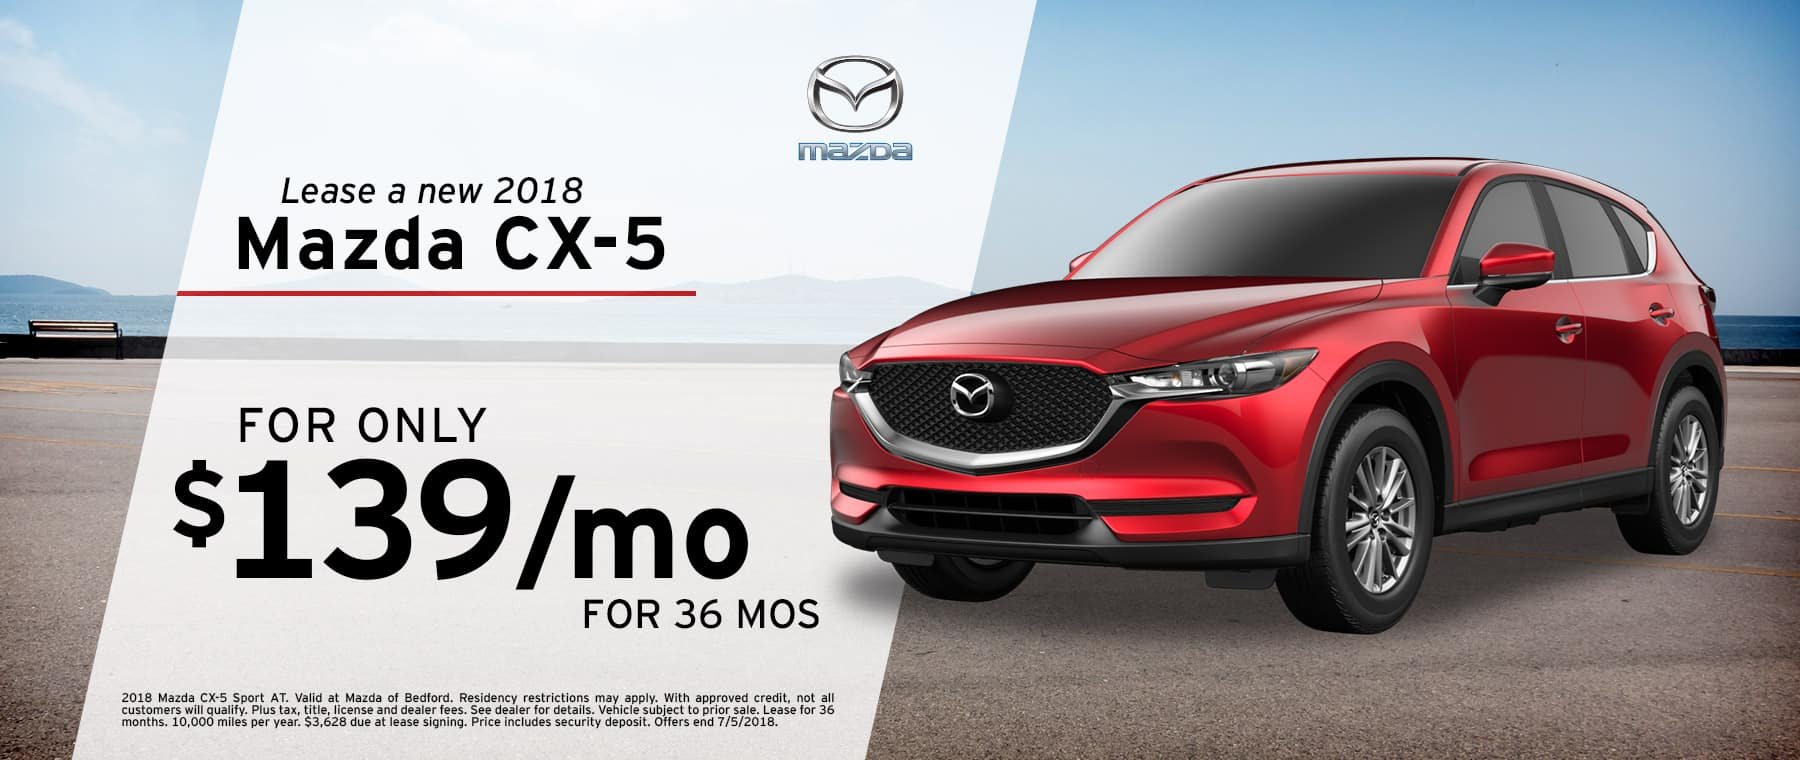 Mazda Bedford Specials | Mazda CX-5